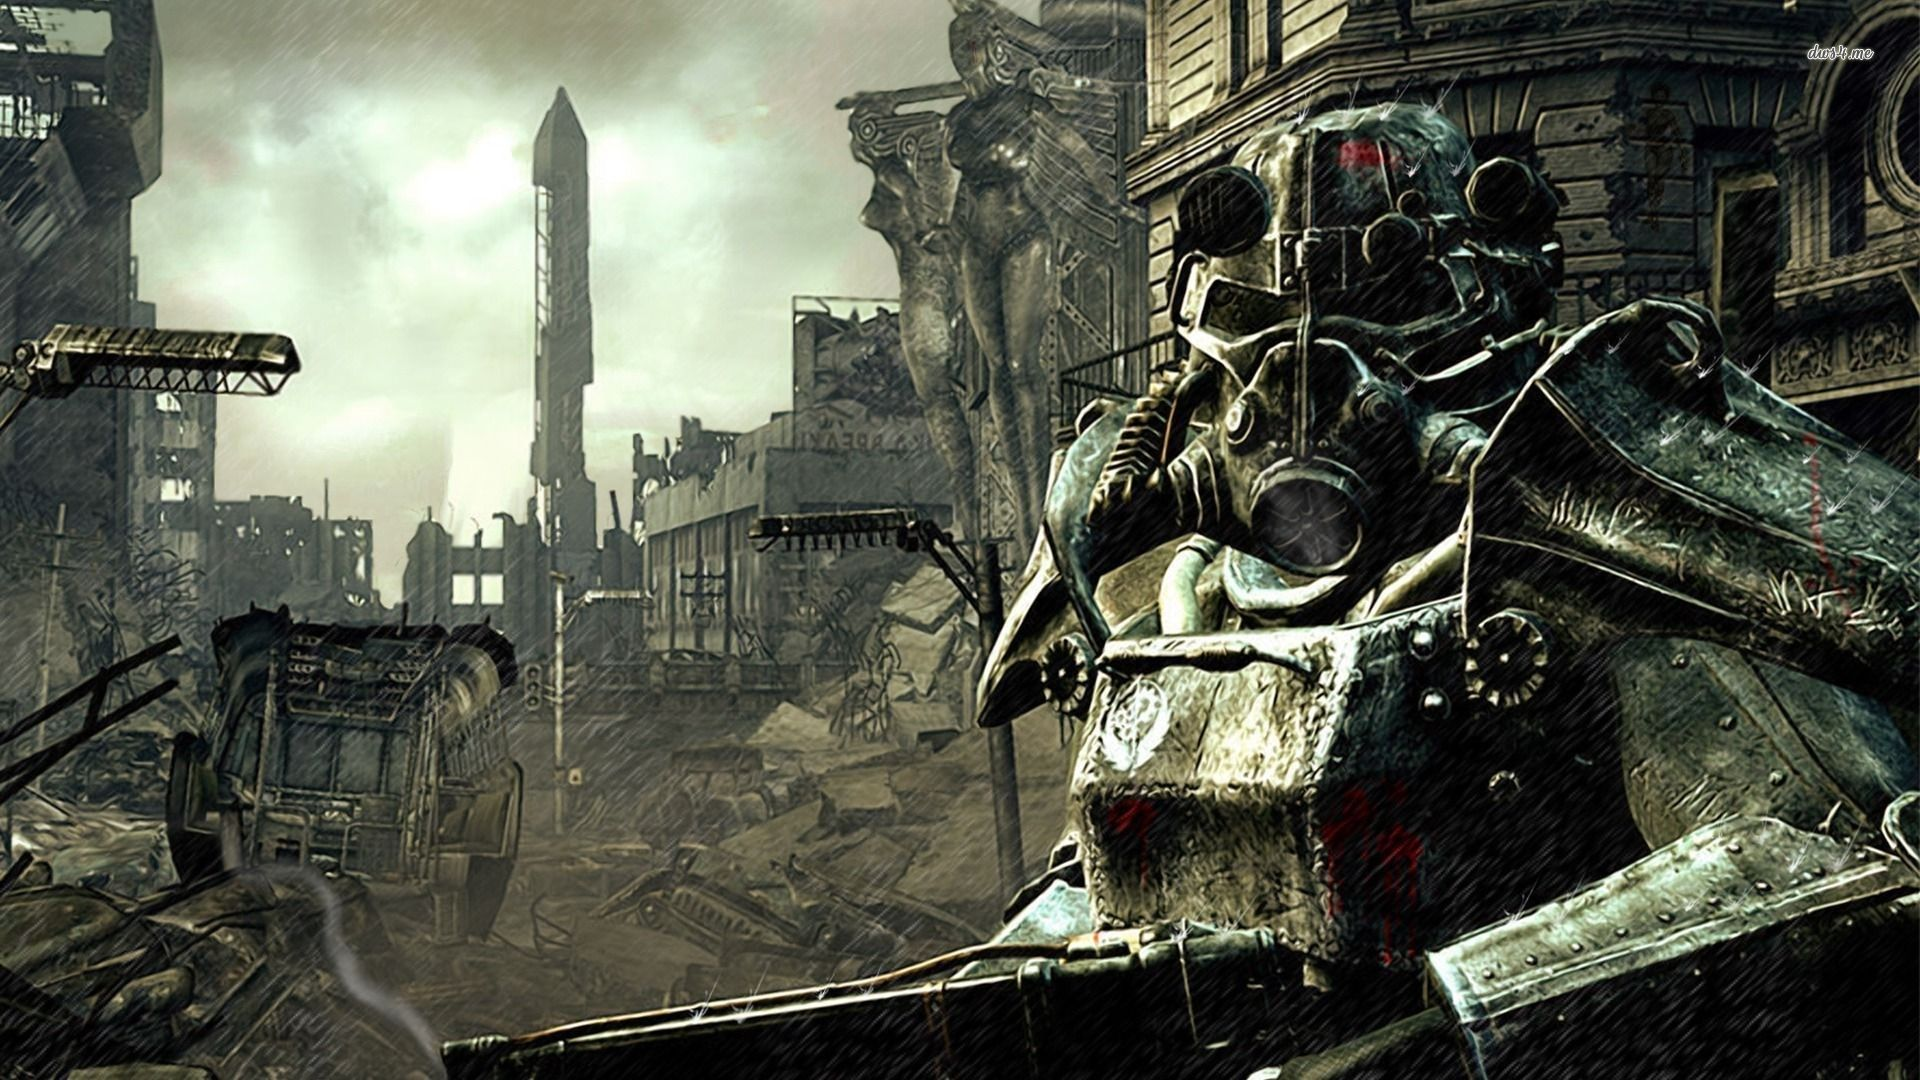 Fallout Free High Resolution Wallpaper Fallout Best Xbox 360 Games Elder Scrolls